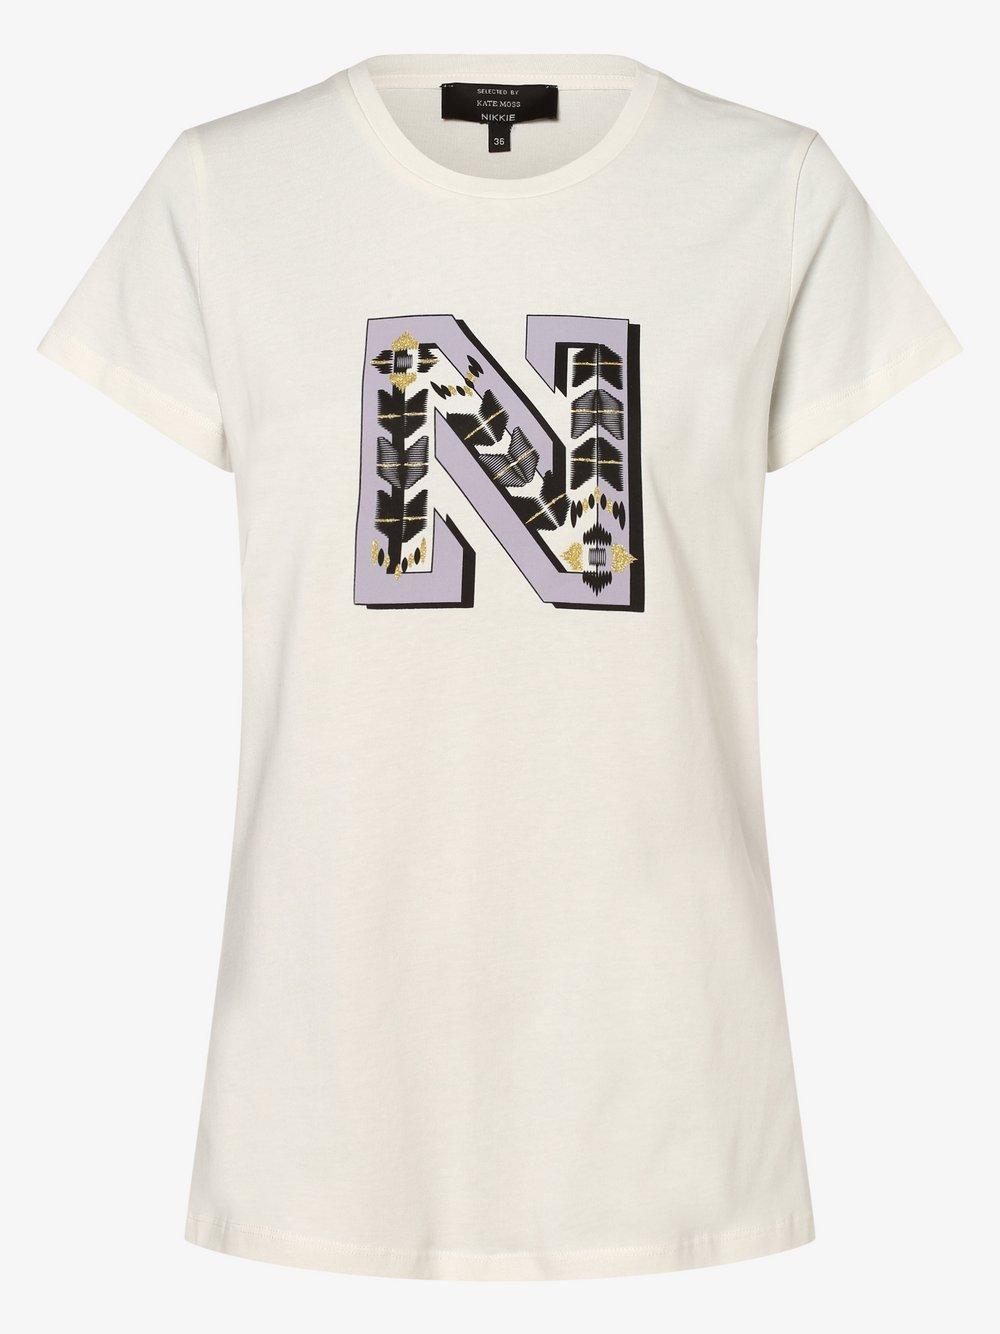 NIKKIE – T-shirt damski, biały Van Graaf 477623-0001-00340